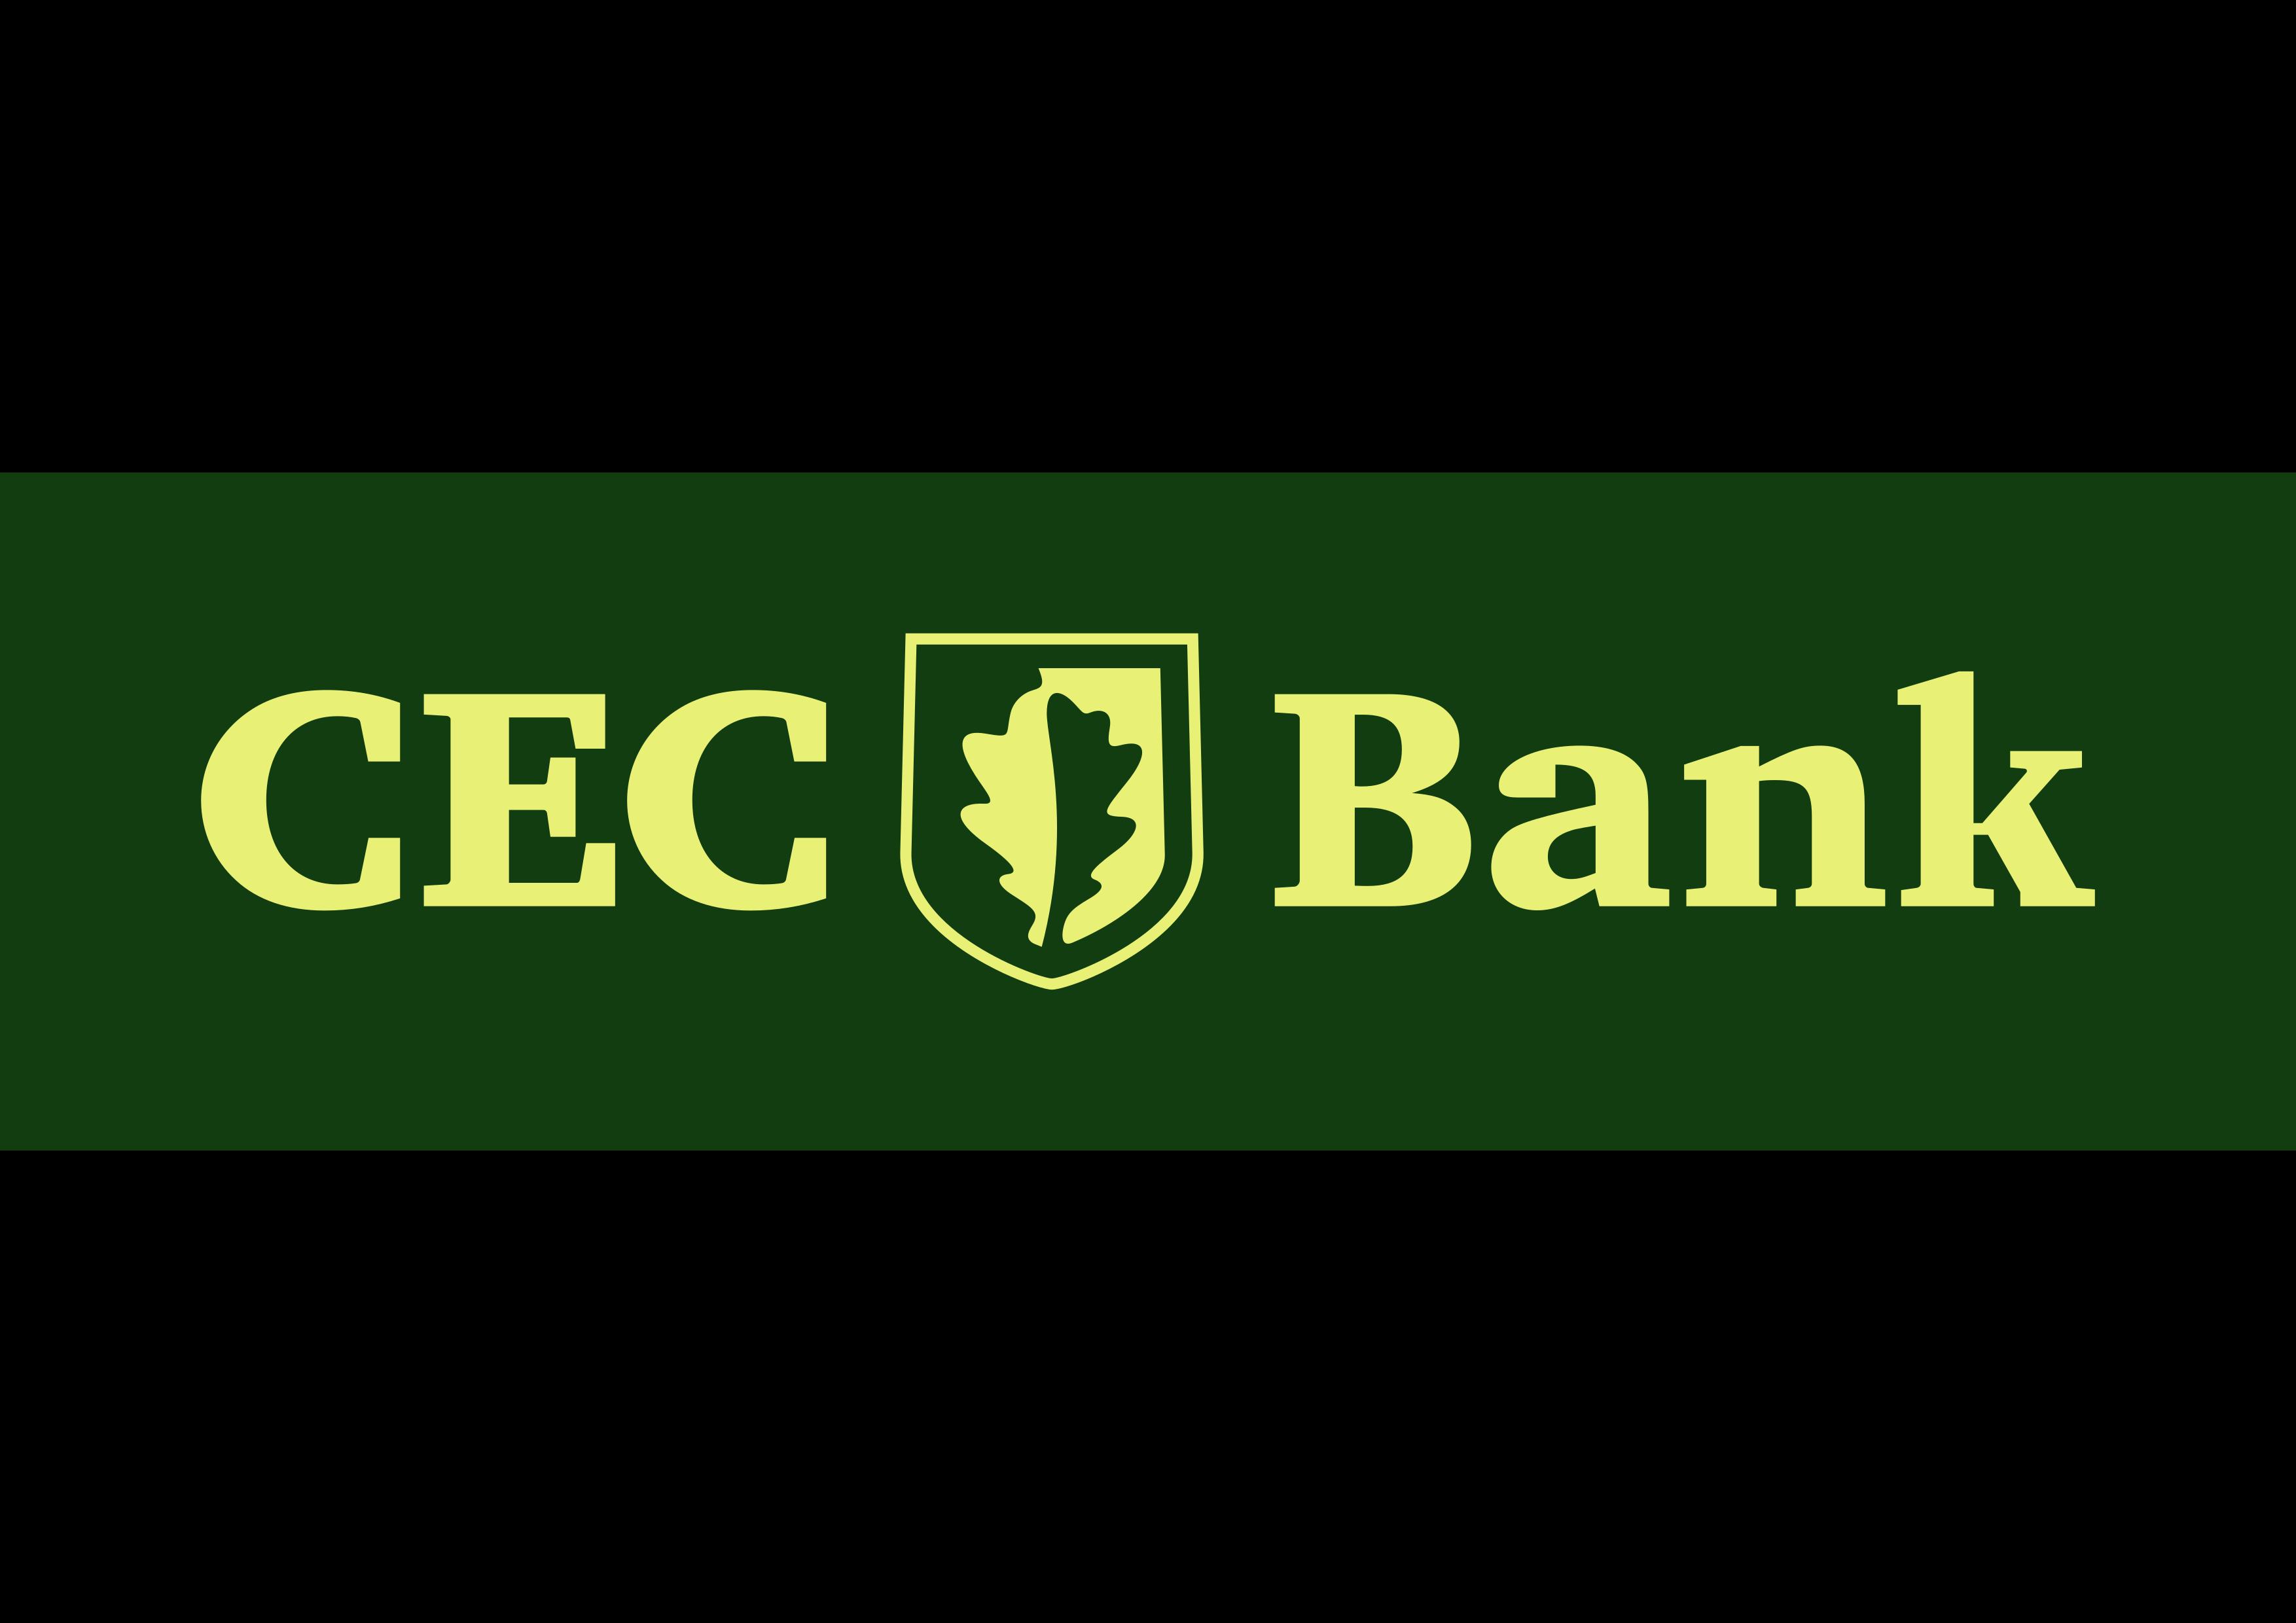 cecbank-logo-neg-A4-2col